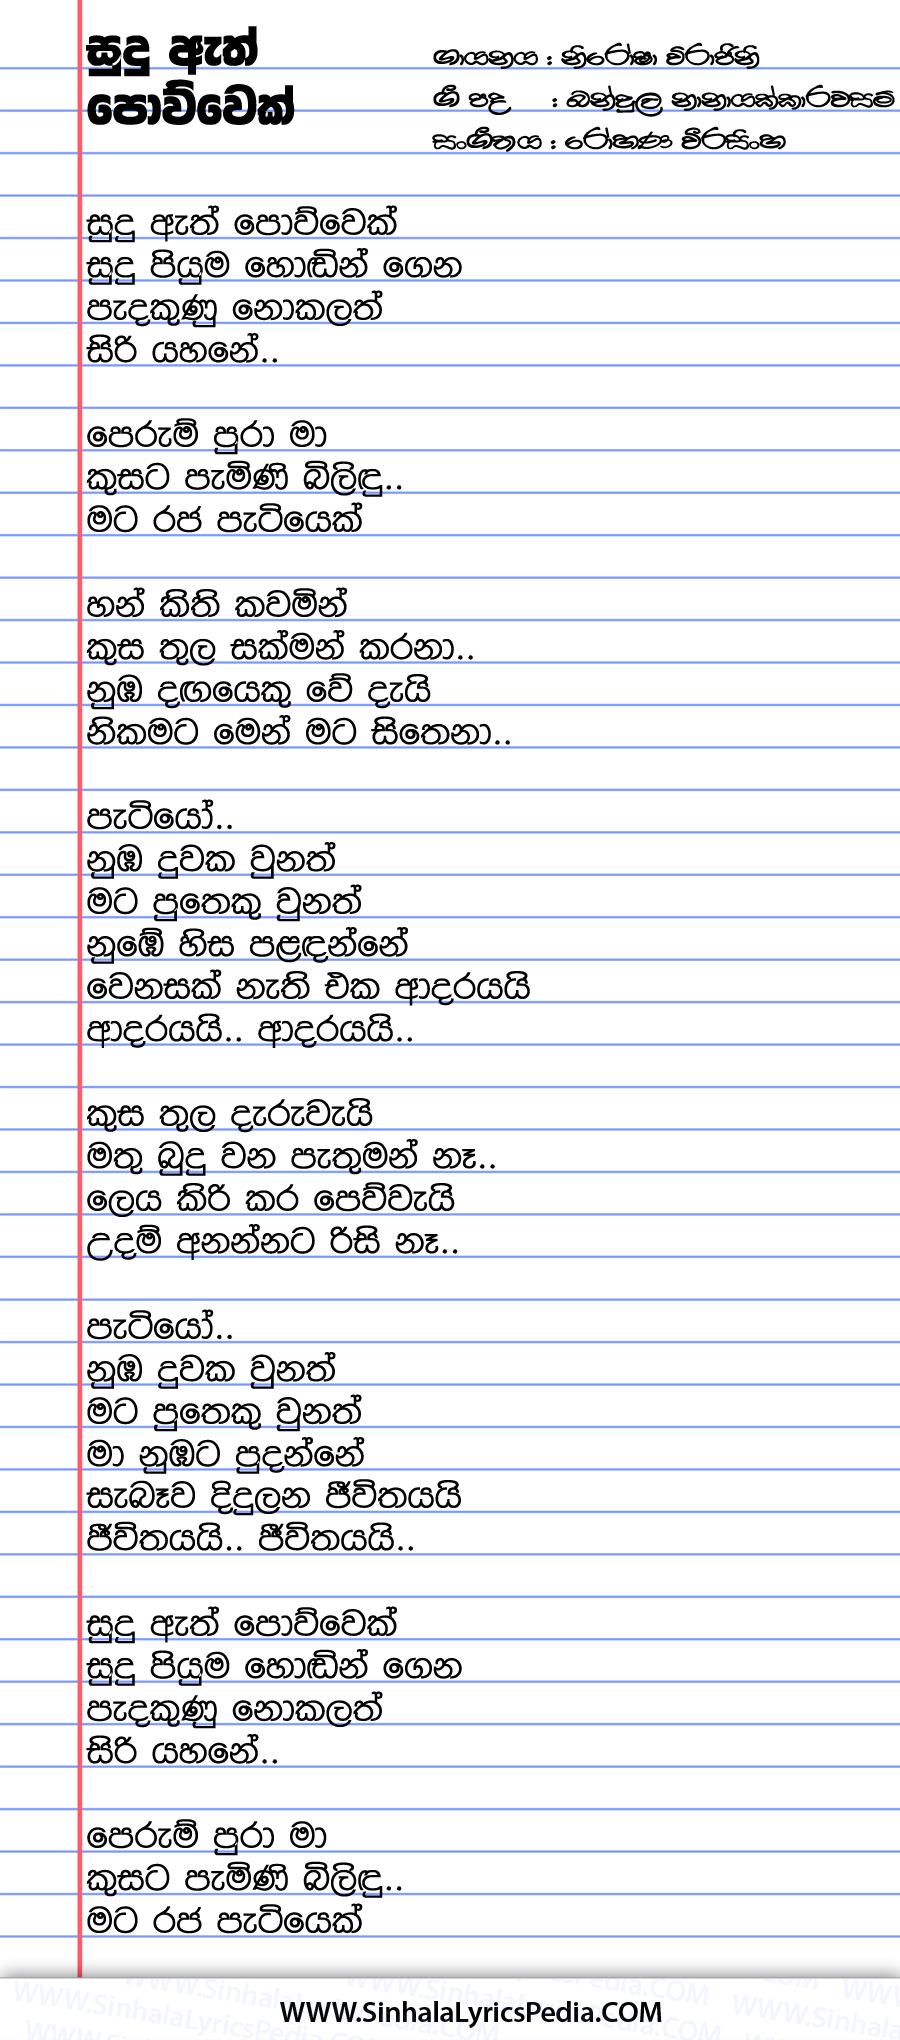 Sudu Ath Powwek Sudu Piyuma Hodin Gena Song Lyrics